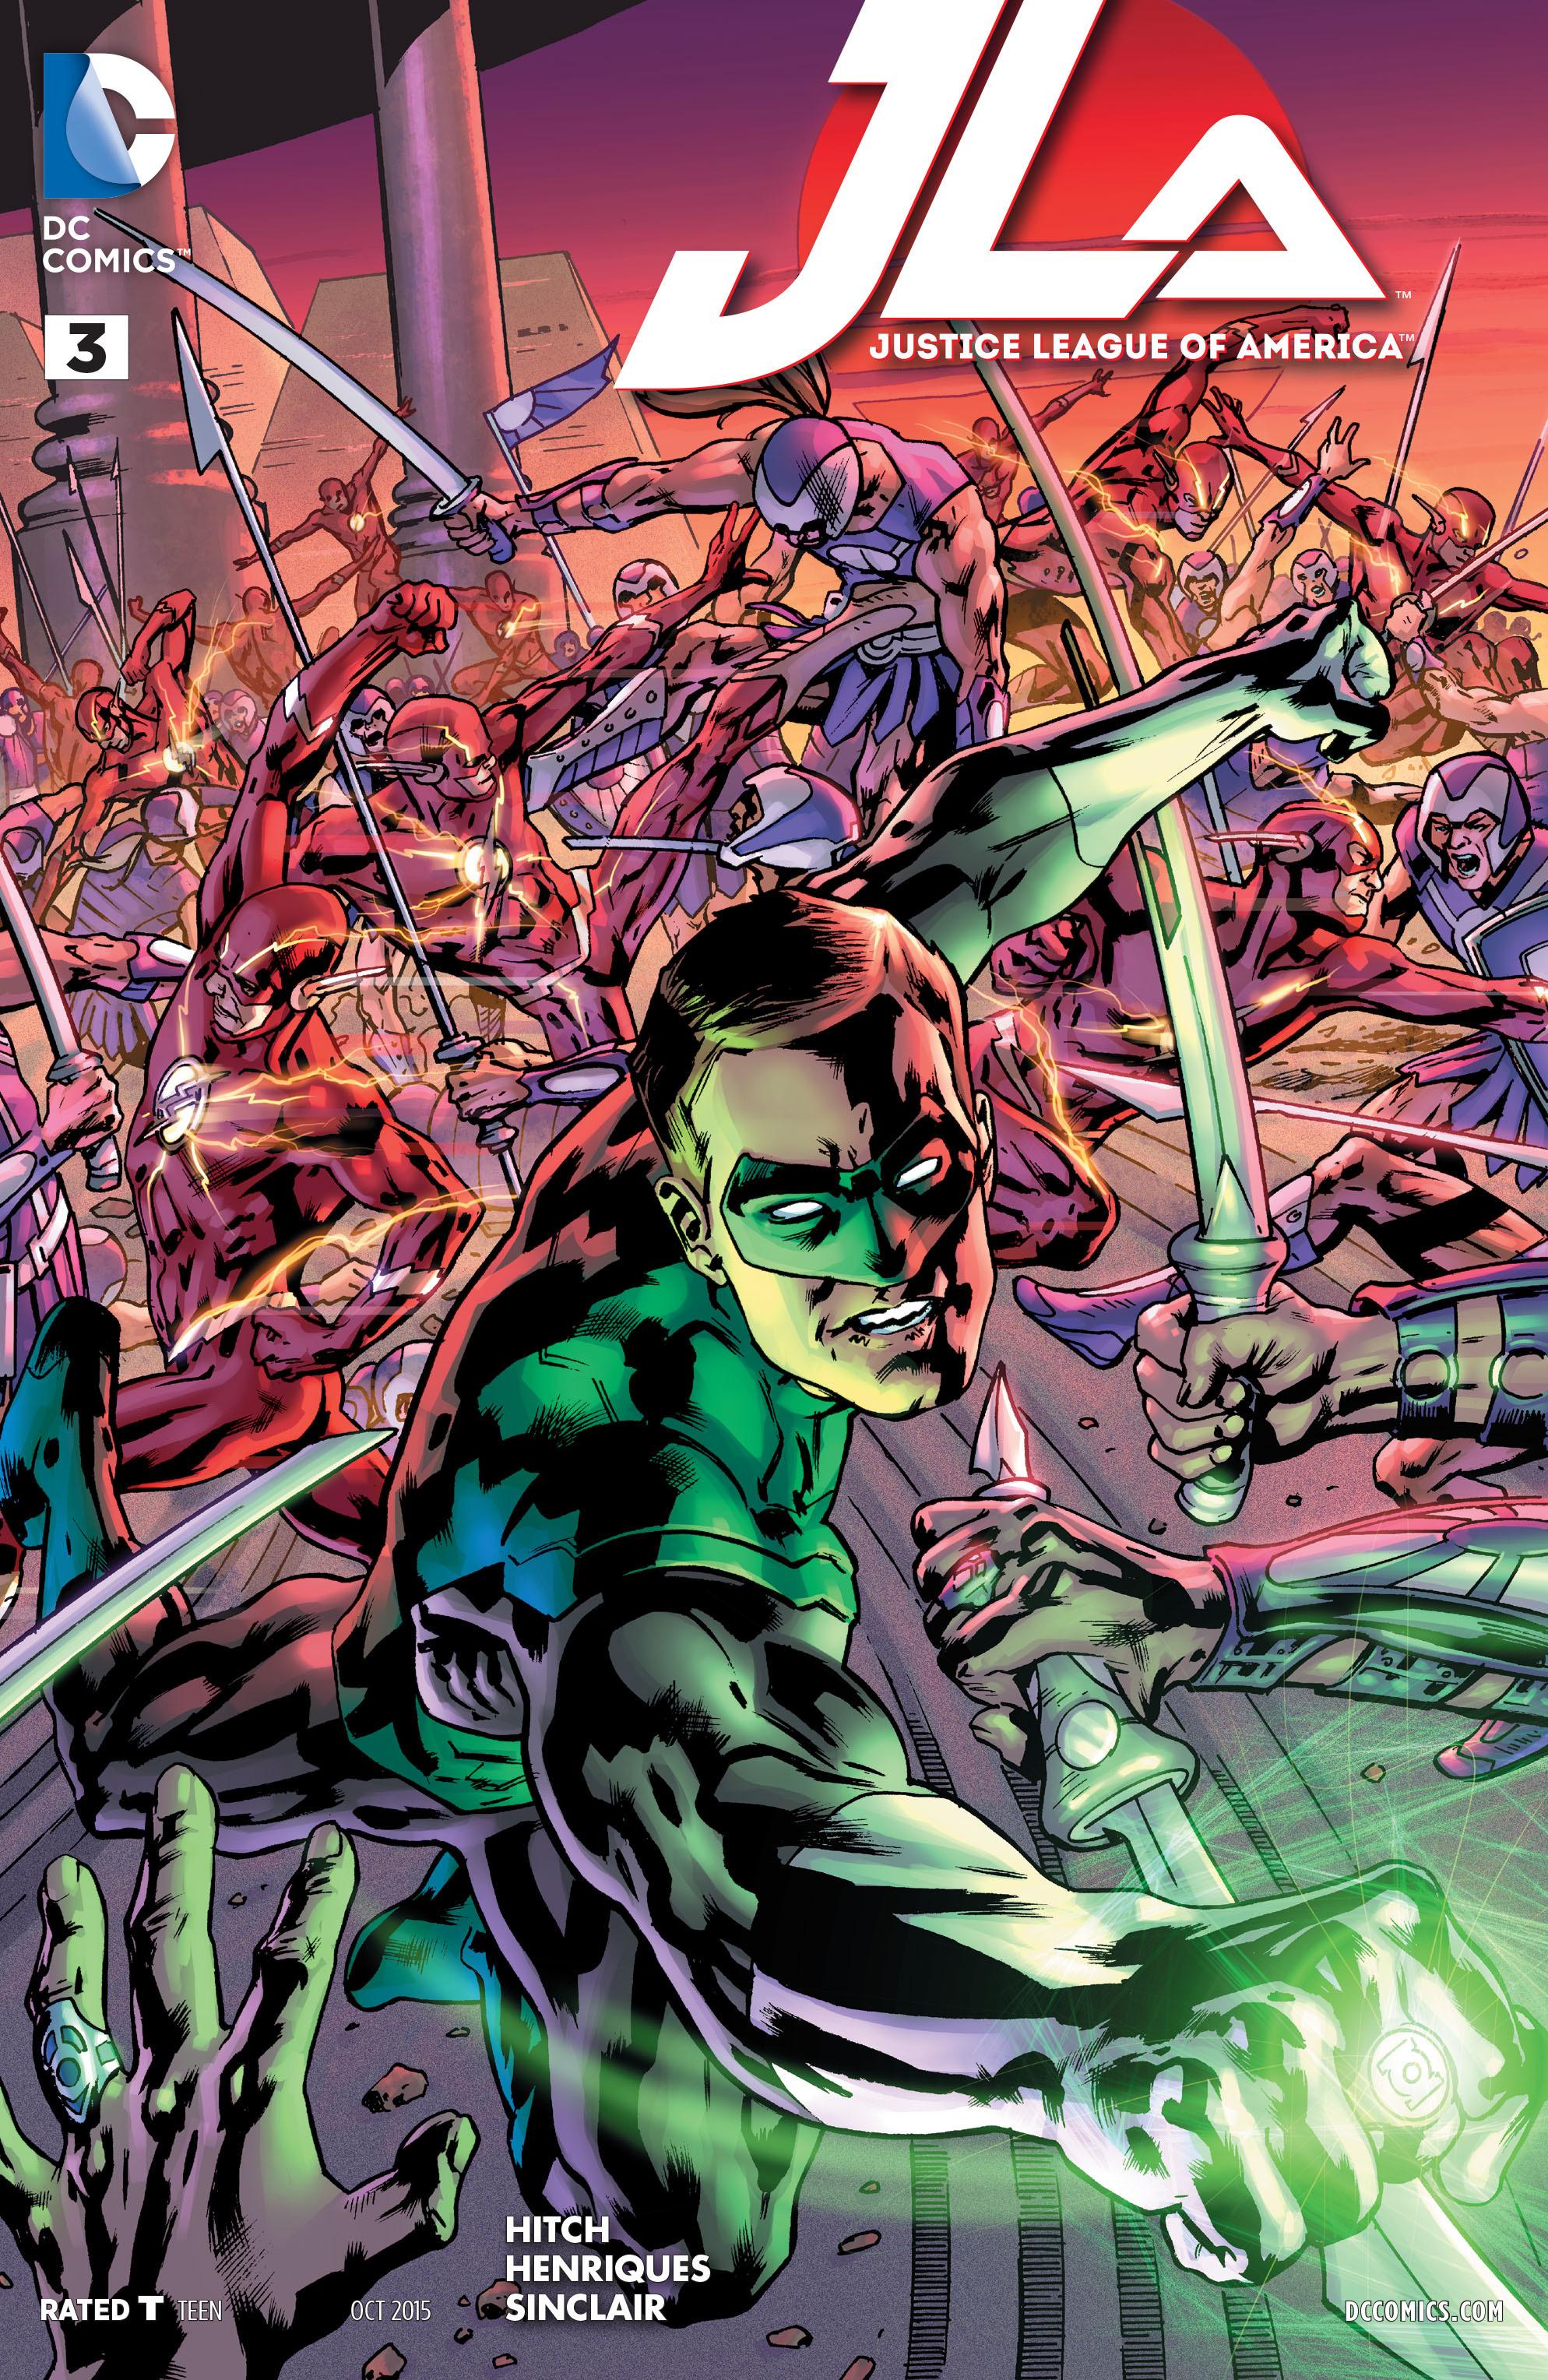 Justice League of America Vol 4 3